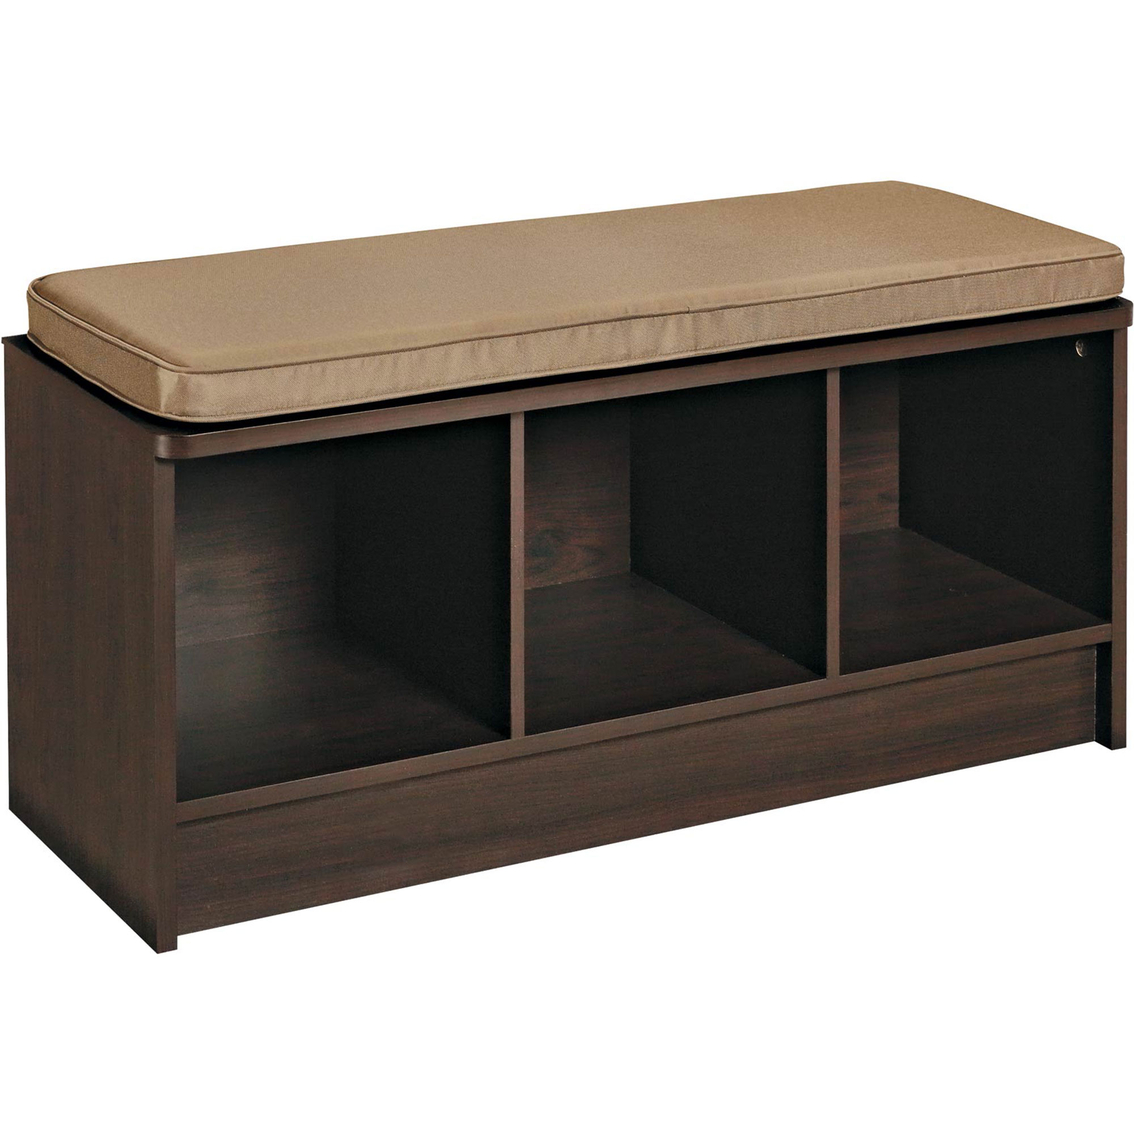 Closetmaid Cubeicals Organizer Bench Storage Cubes Home Appliances Shop The Exchange